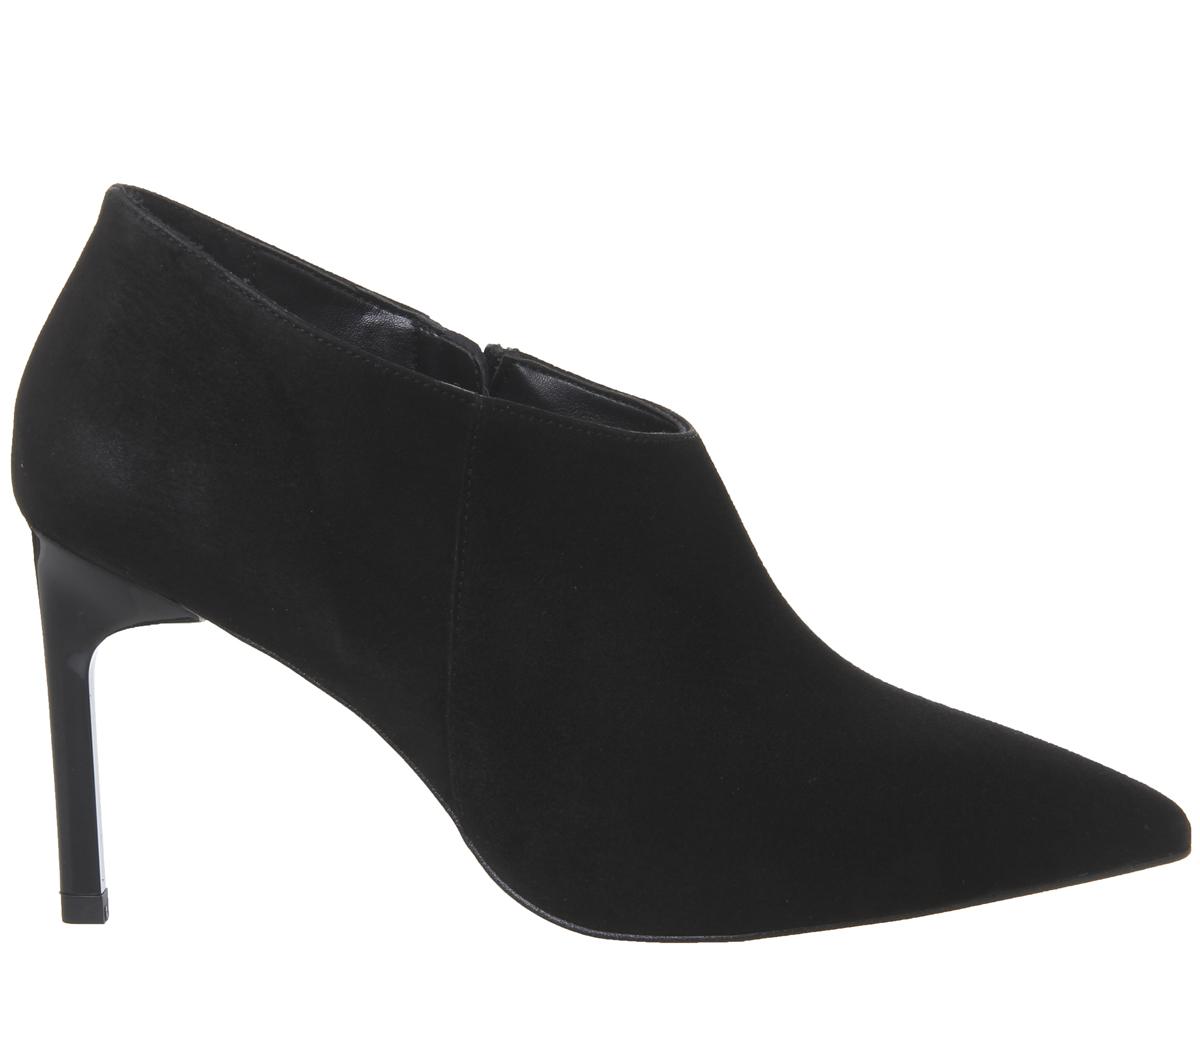 neri ufficio pelle Scarpe Heel Shoeboots da donna per in scamosciata Tacchi Sleek Mairead Txw7Aqax